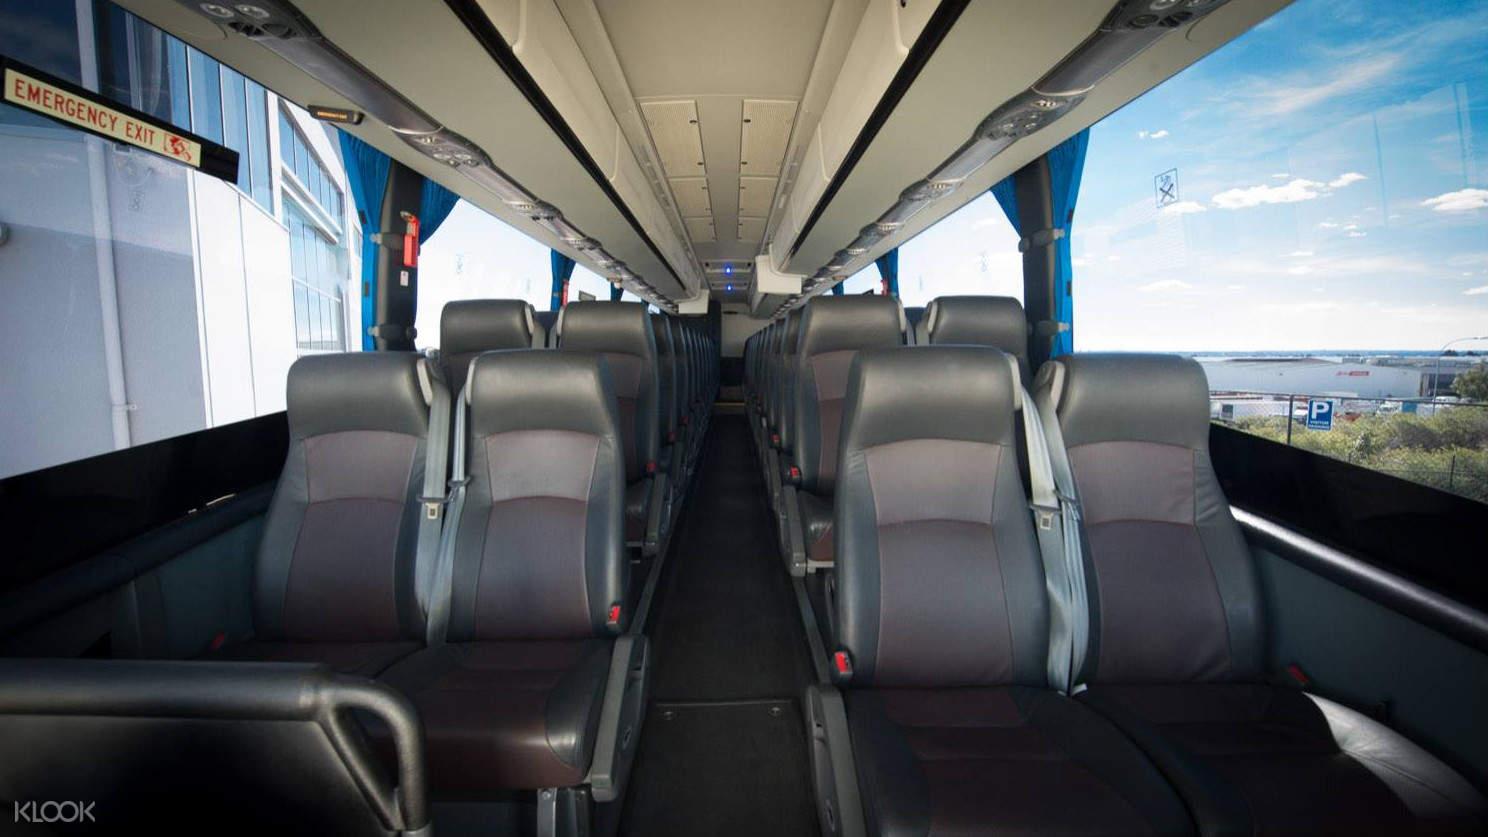 Greyhound Australia Bus Pas (3 Months), Sydney, Australia - Klook